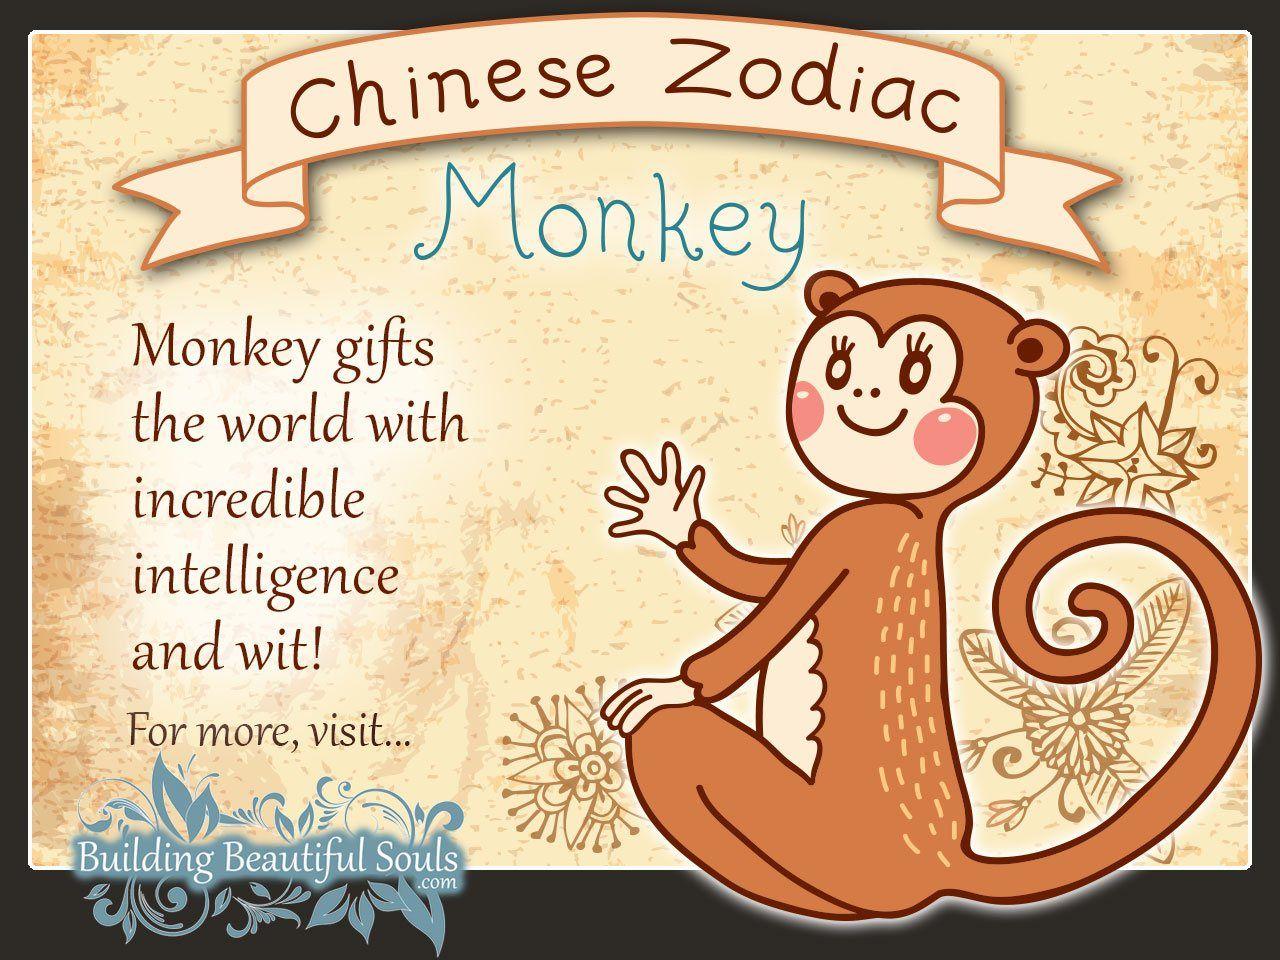 Chinese Zodiac Monkey Year Of The Monkey Chinese Zodiac Signs Meanings Chinese Zodiac Signs Year Of The Monkey Chinese Zodiac